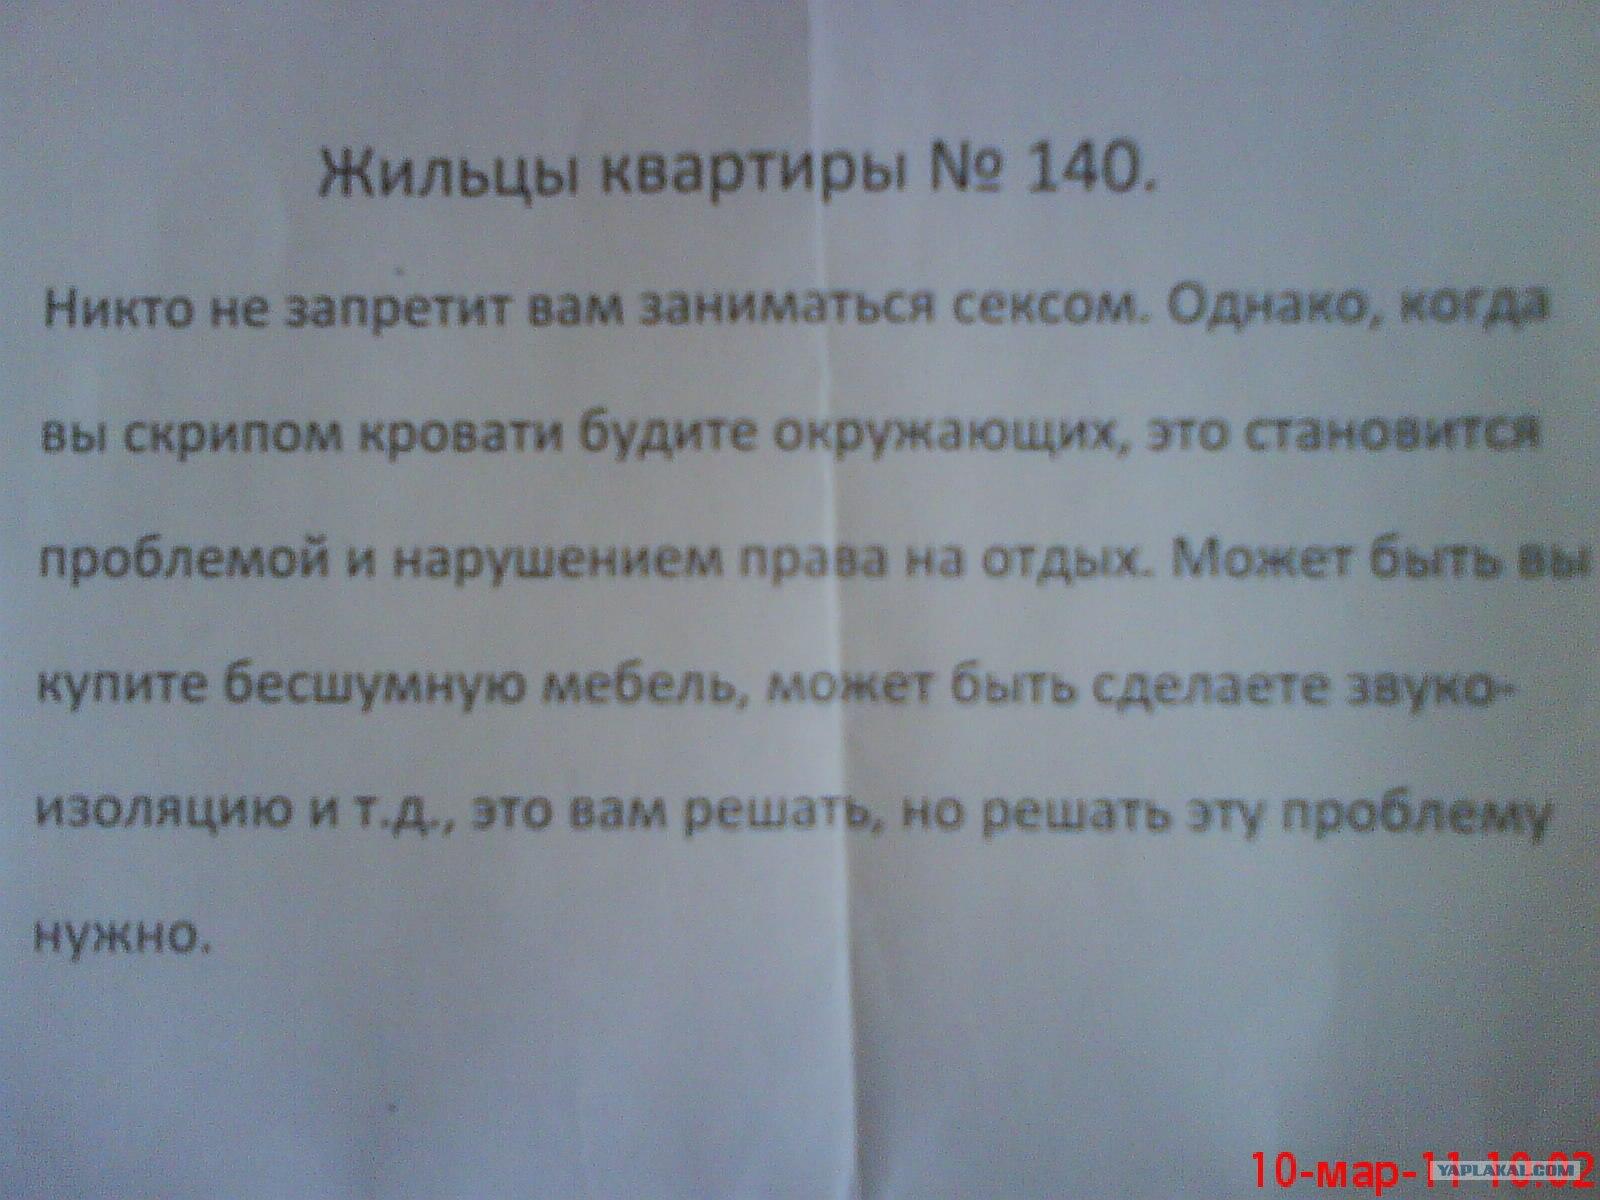 http://s00.yaplakal.com/pics/pics_original/6/8/4/333486.jpg